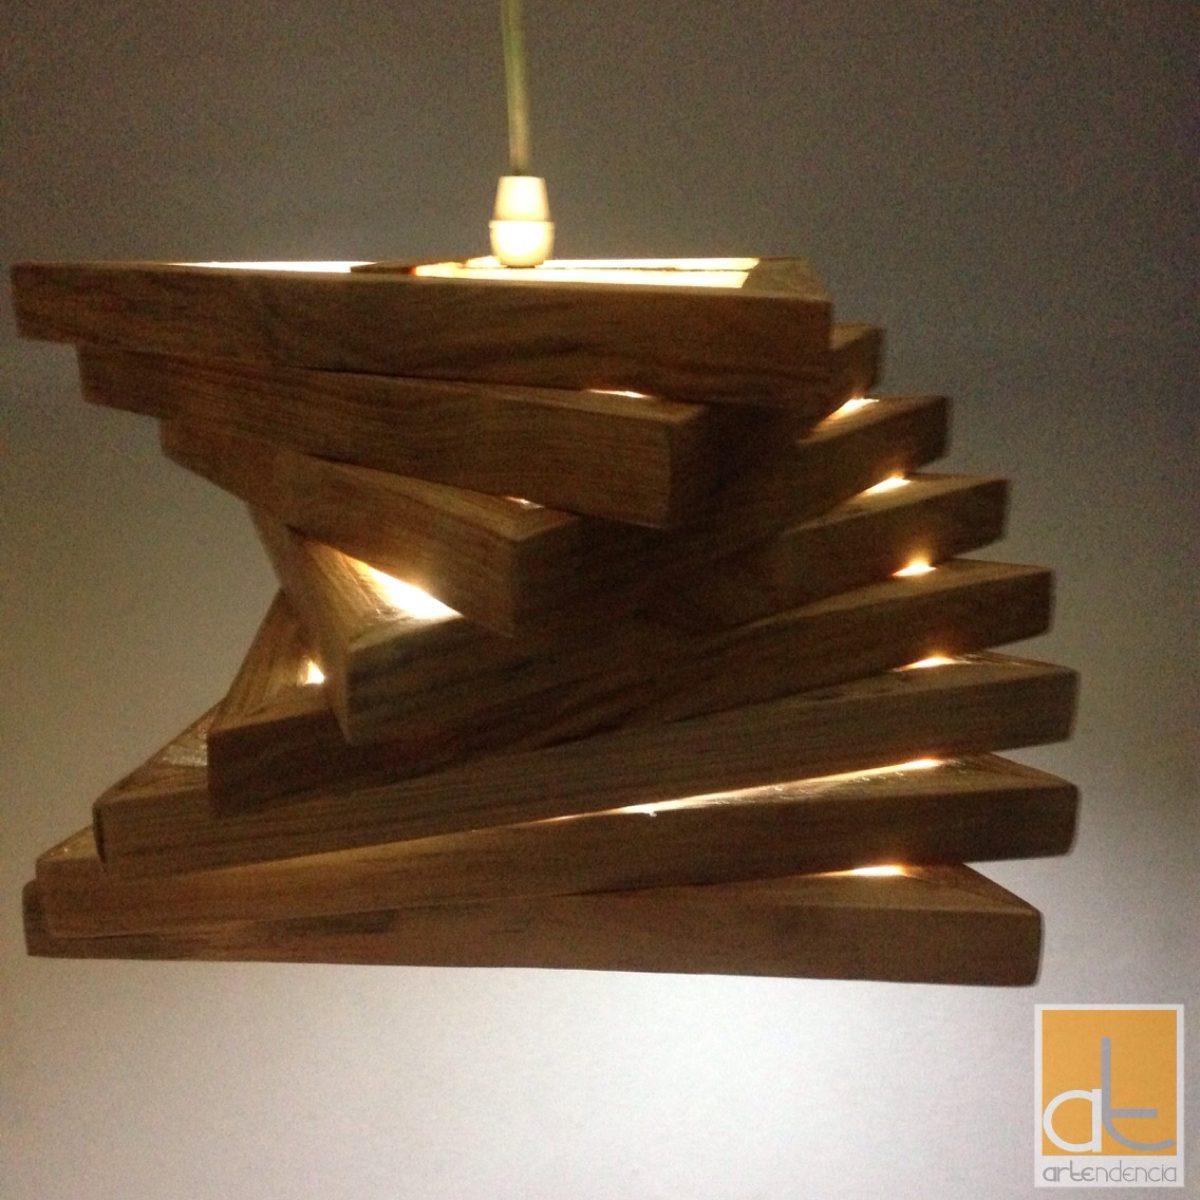 L mpara de madera de techo moderna artendencia helicoidal for Plafones de madera pared